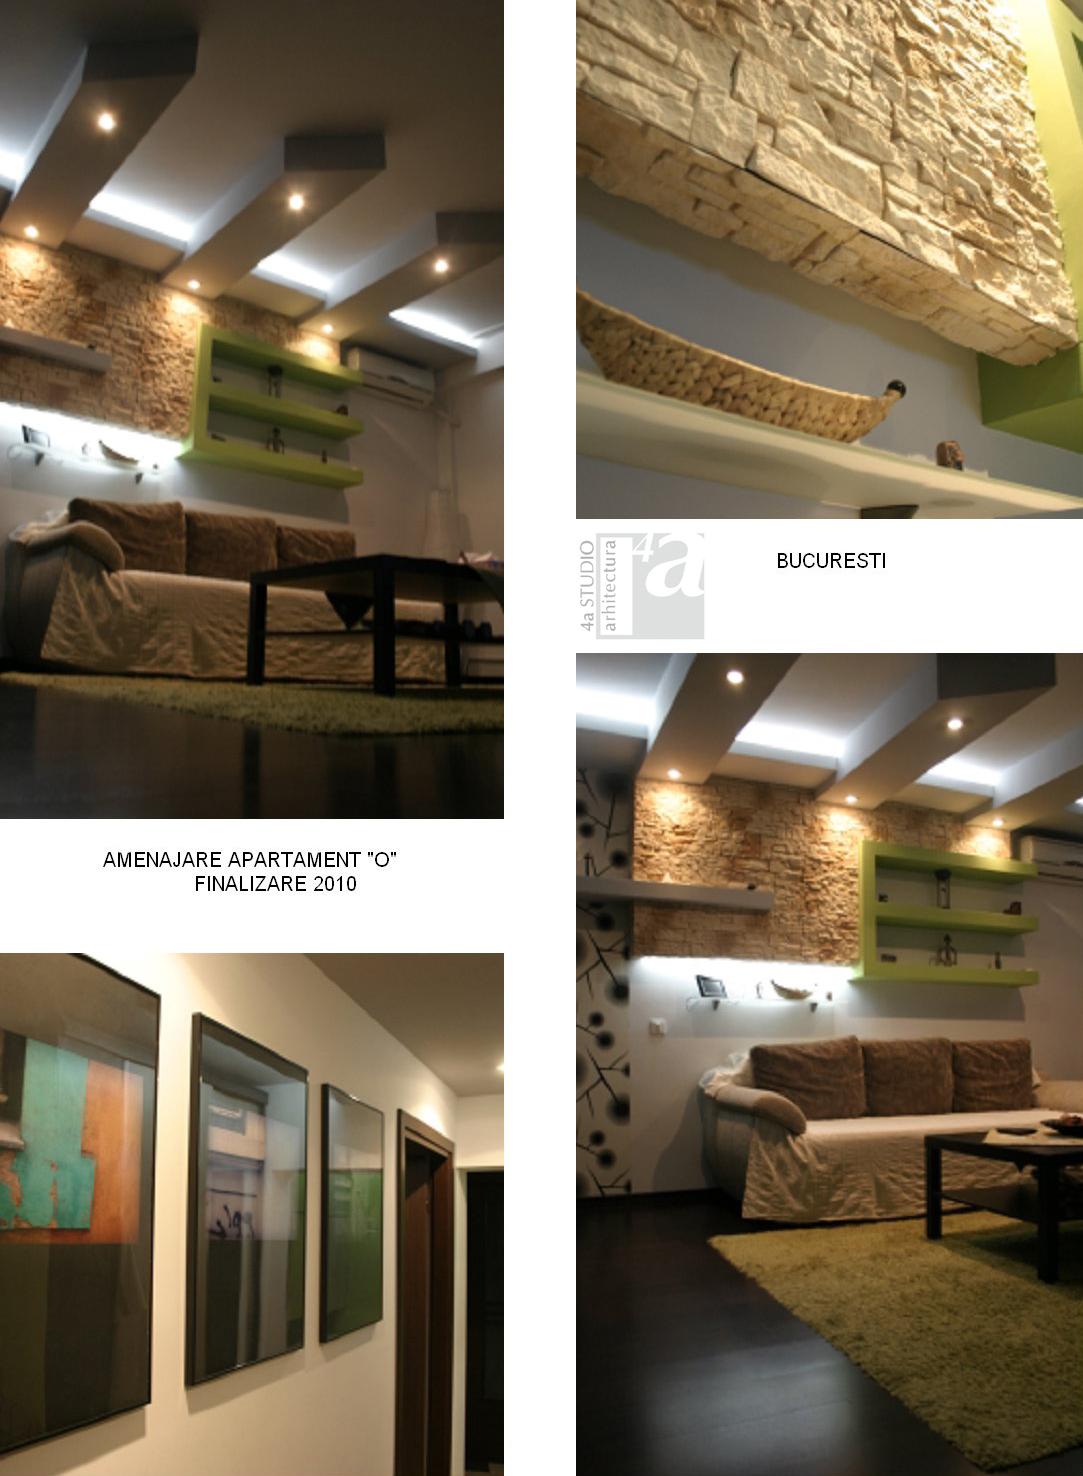 Amenajare apartament H - Bucuresti   - Poza 6